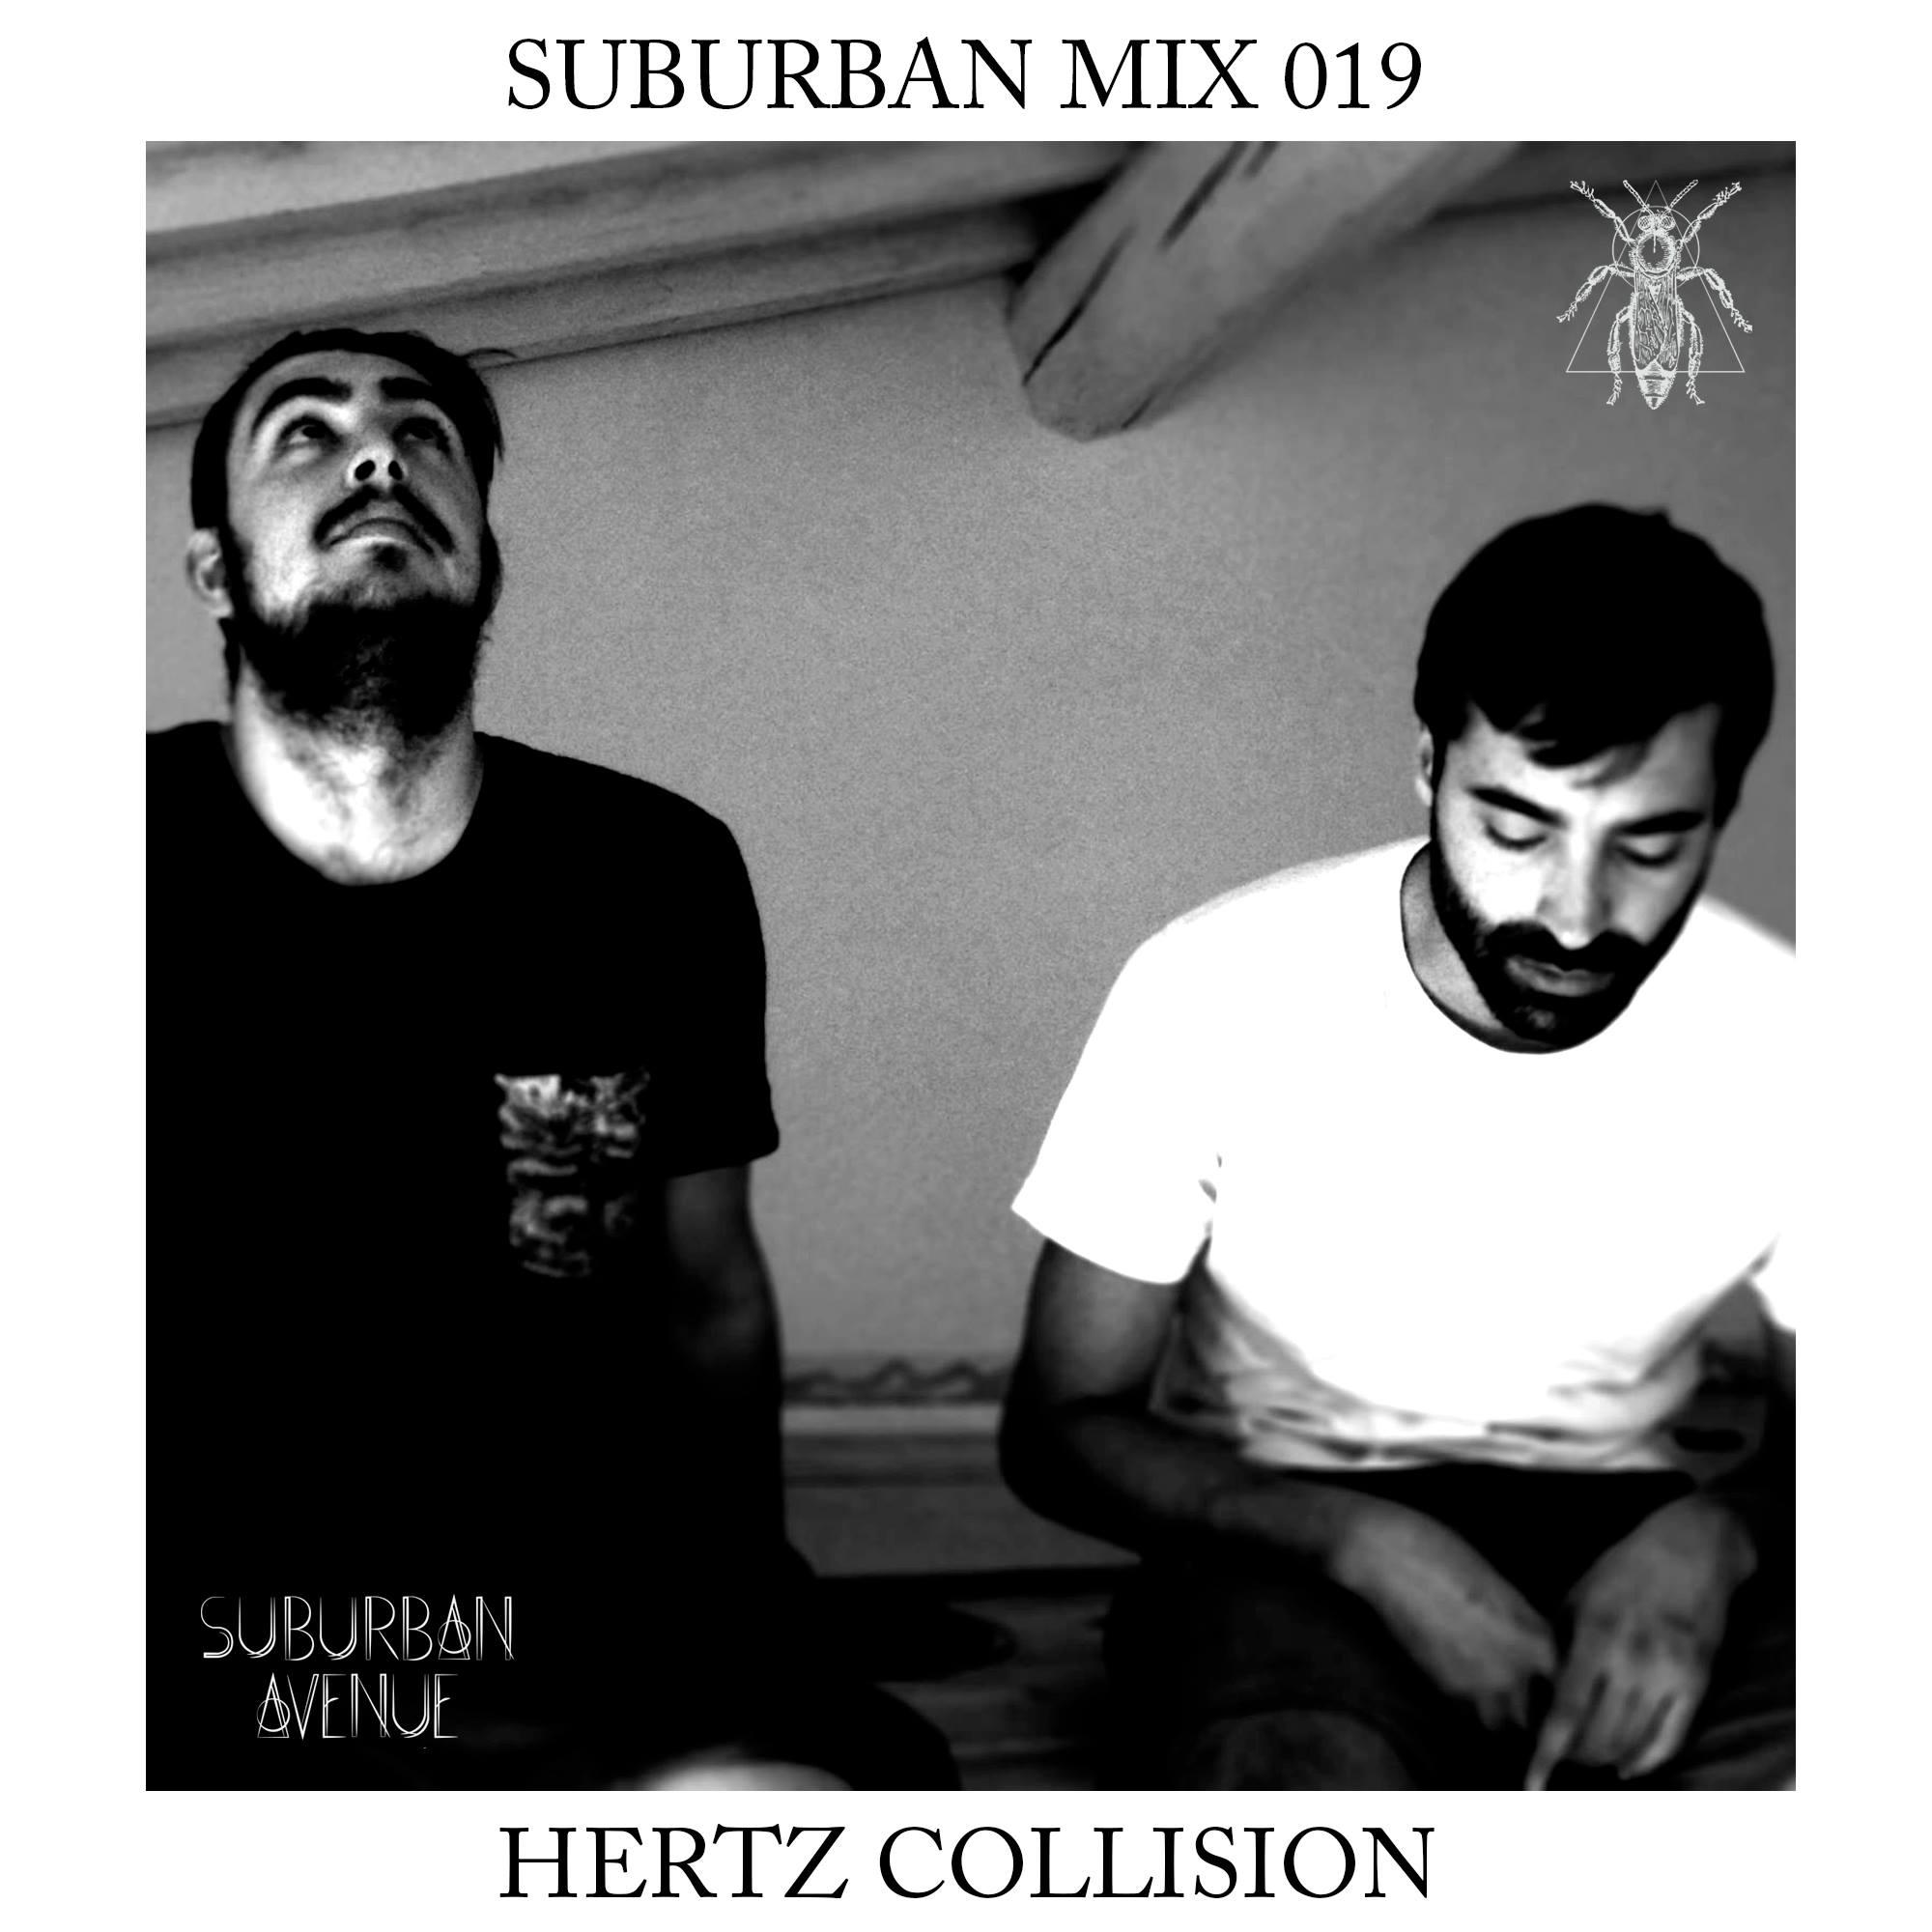 Suburban Mix 019 - Hertz Collision